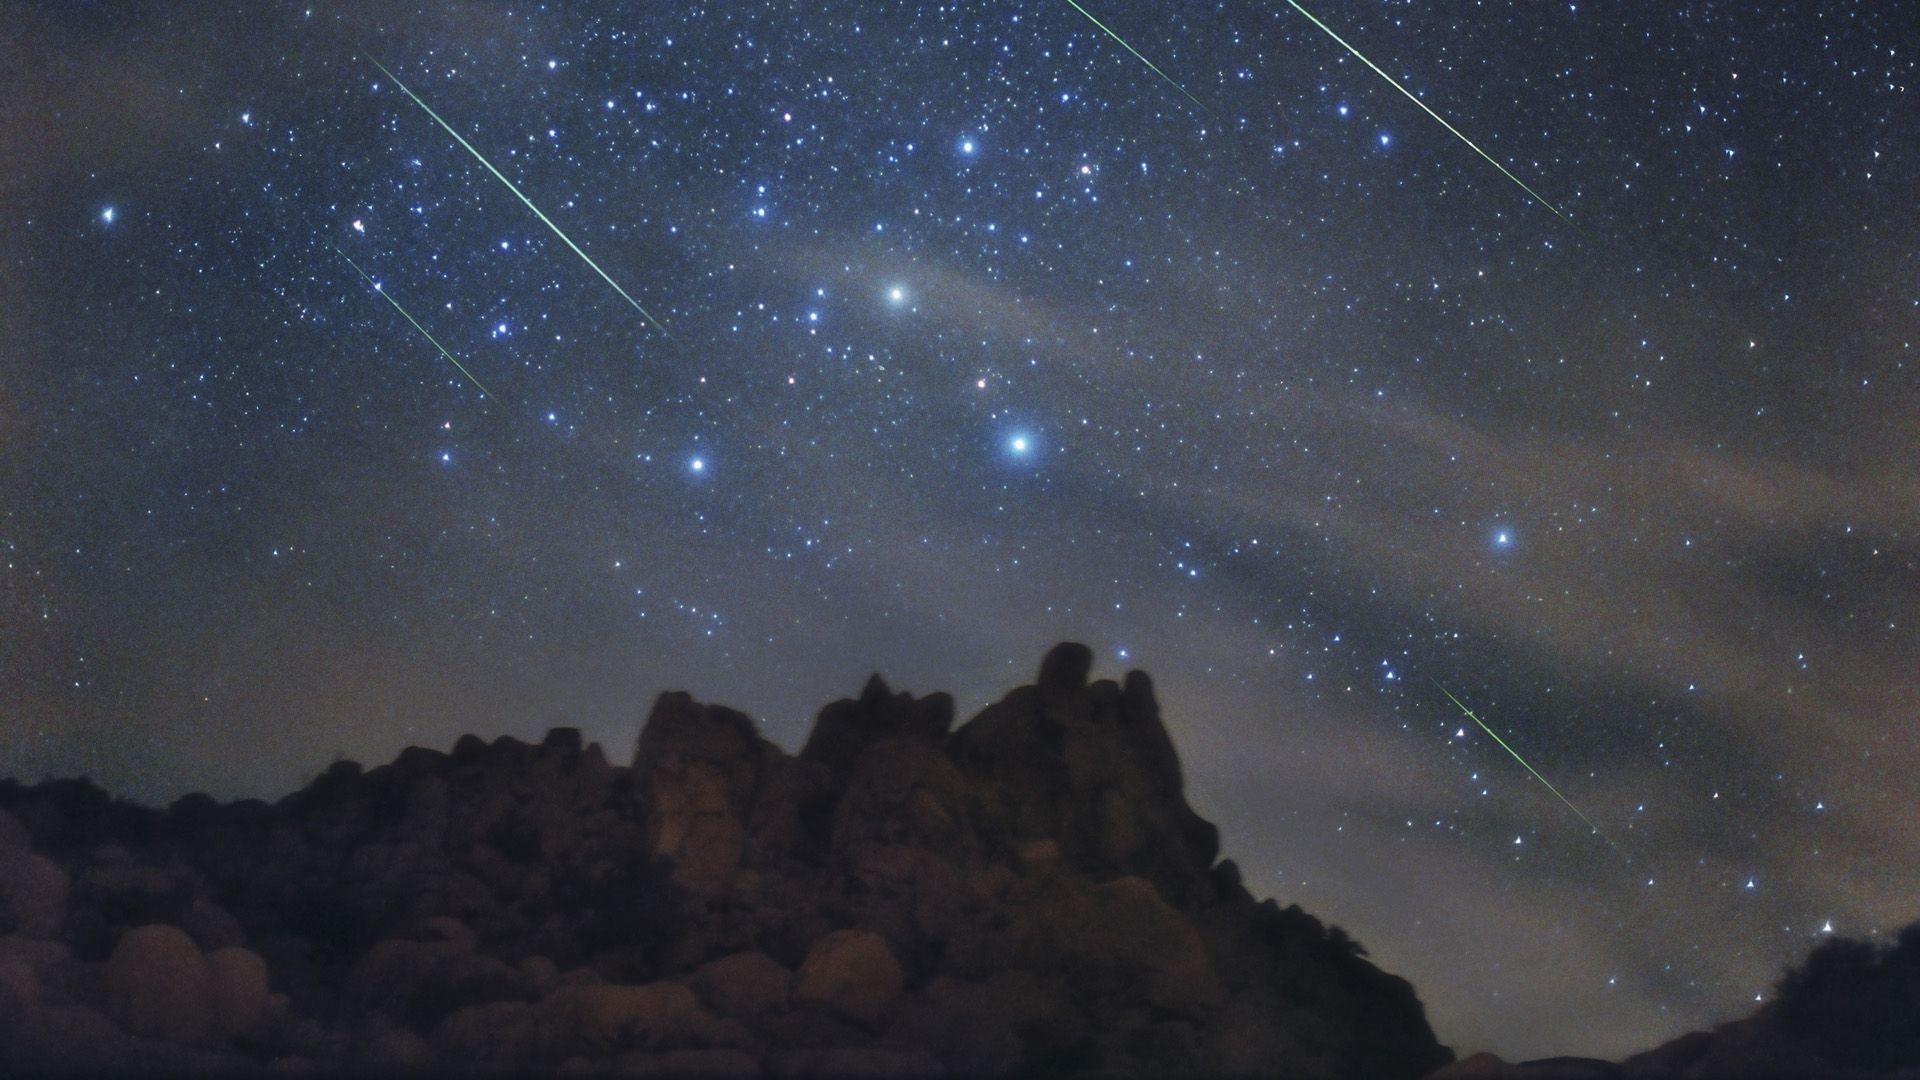 Shooting Stars Wallpaper 76 Images